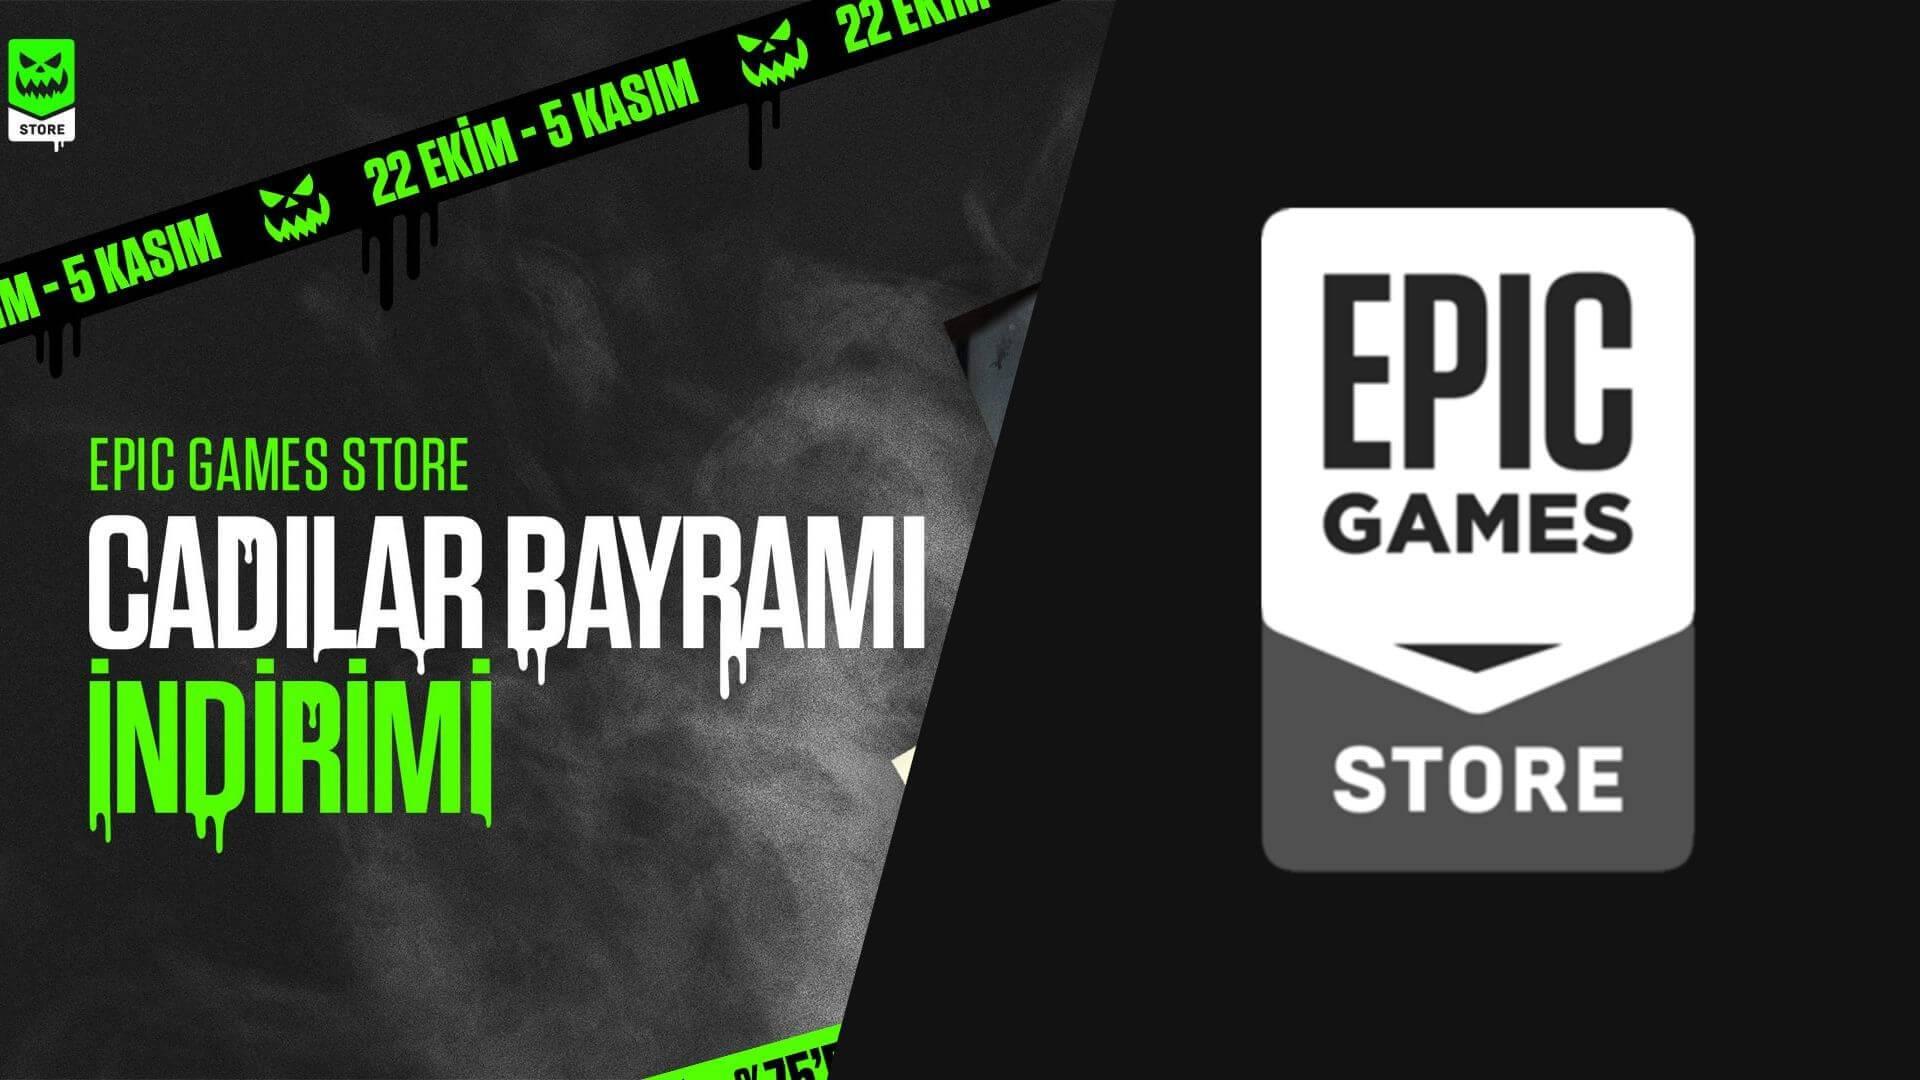 epic games store 2020 cadilar bayrami indirimi